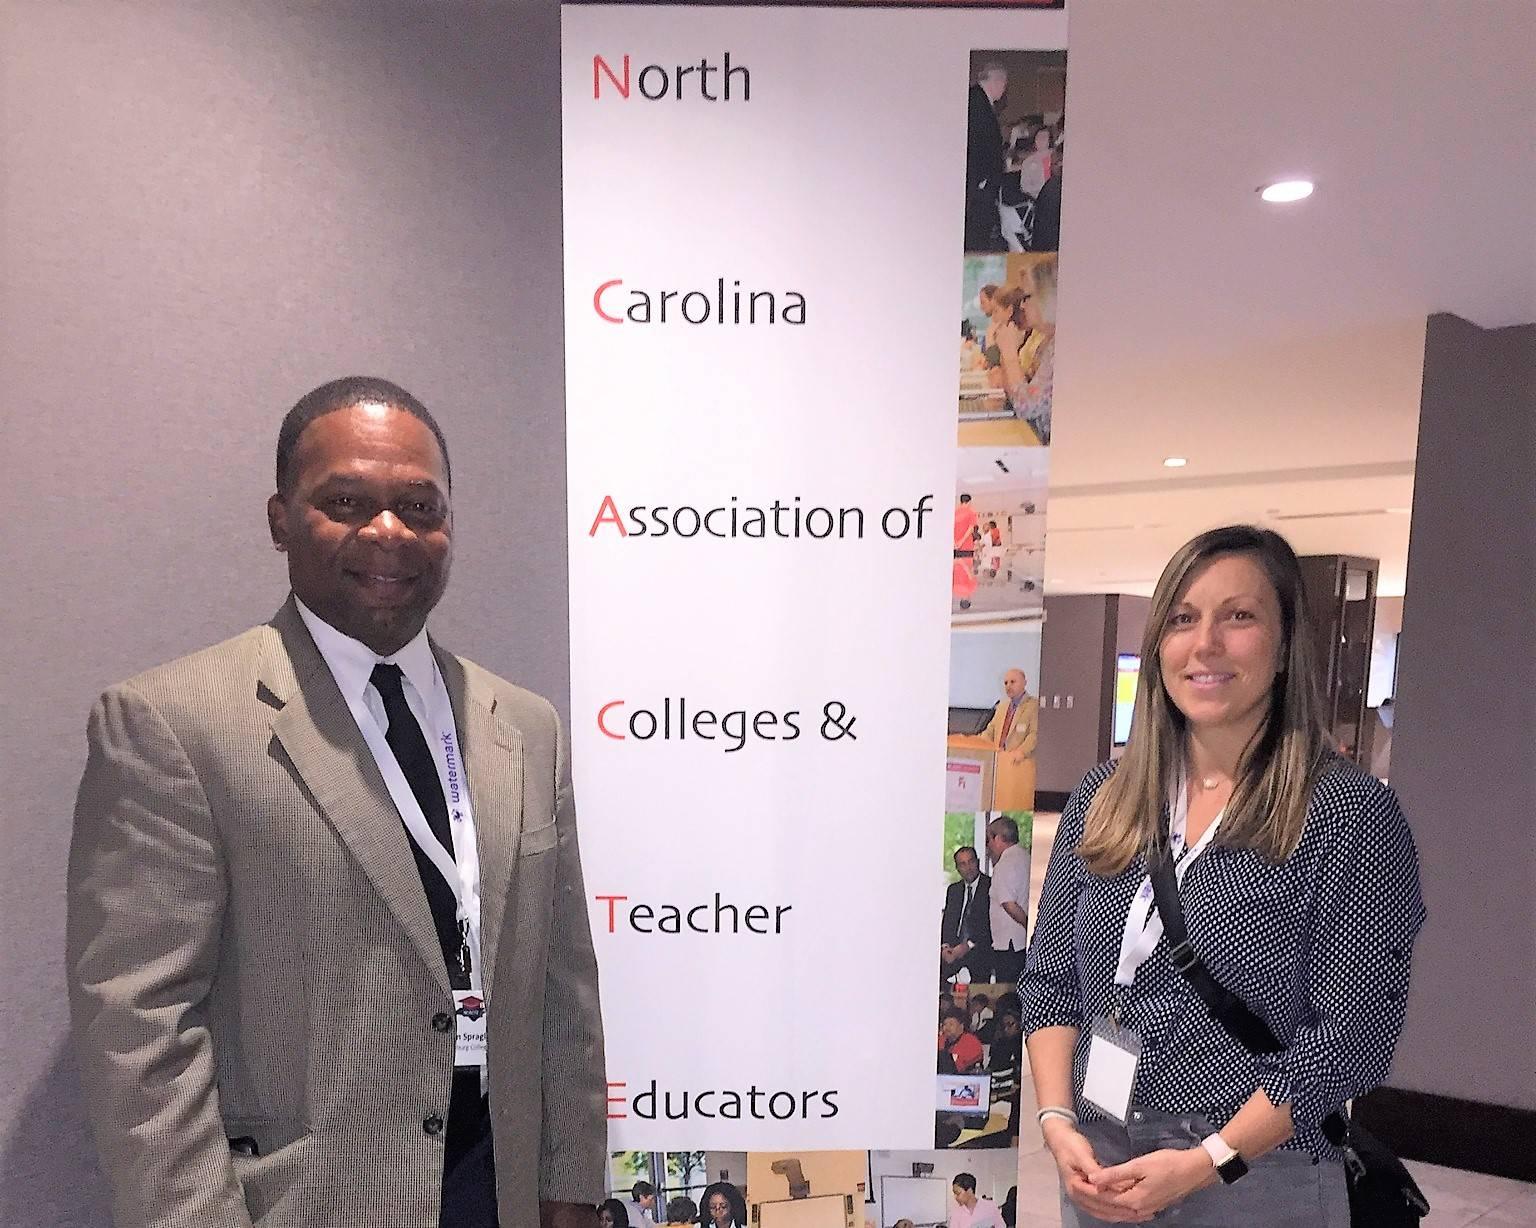 Dr. Kelvin Spragley and Mrs. Caitlin Frederick at the 37th Annual North Carolina Teacher Education Forum (NCACTE).